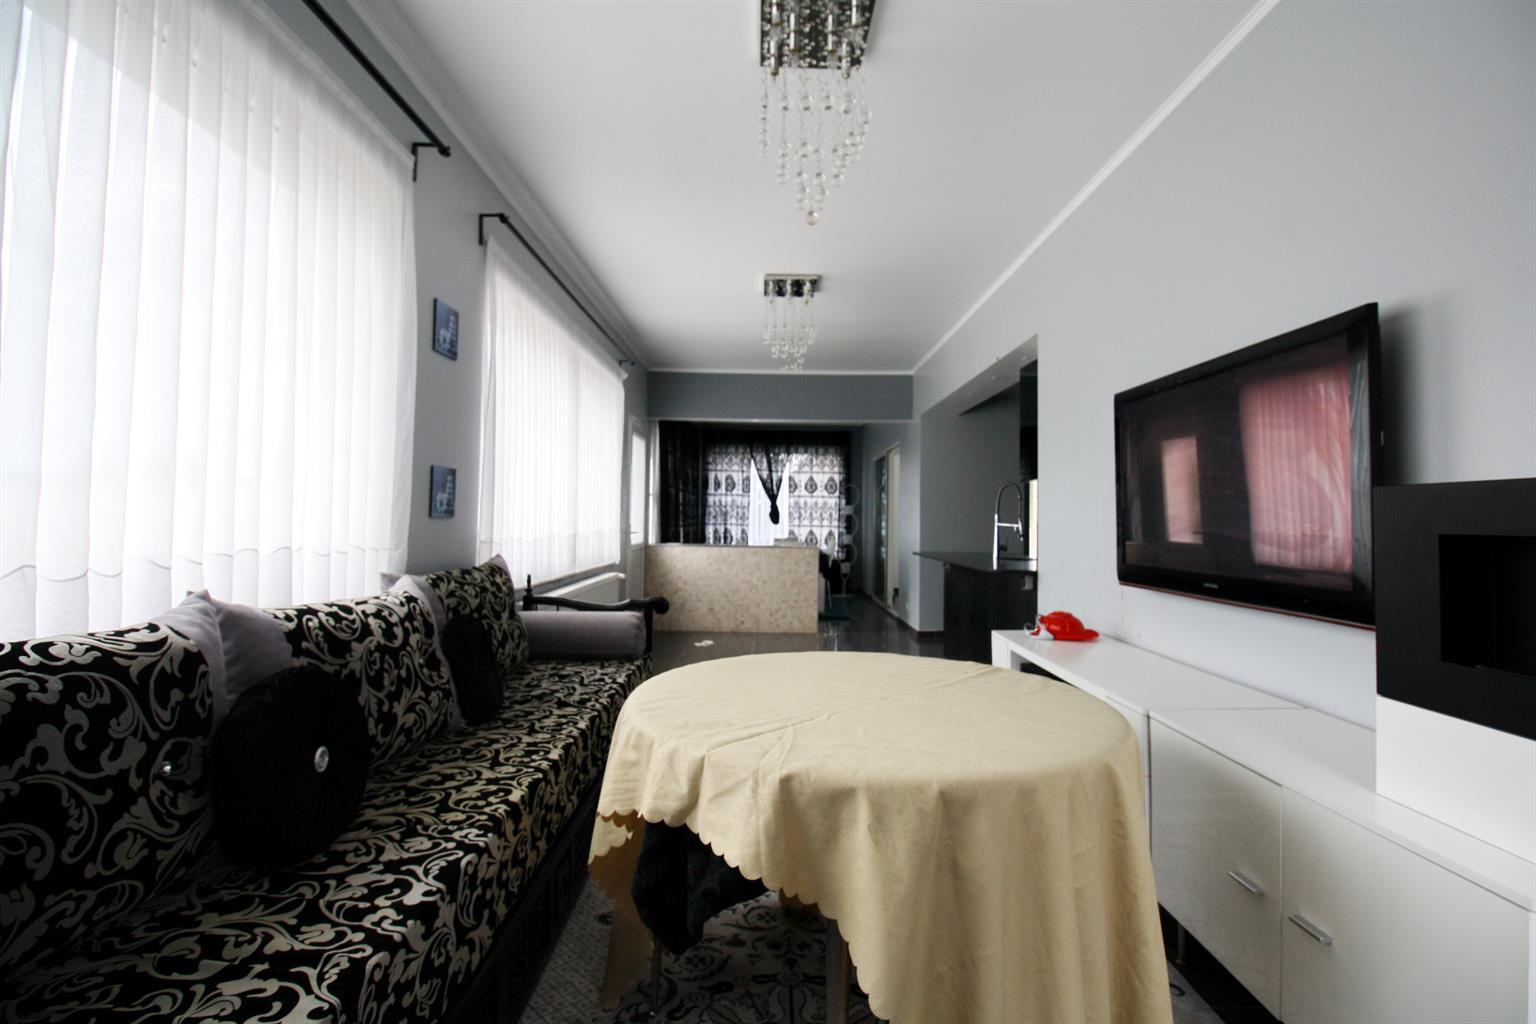 Maison - Roosdaal - #4363070-6